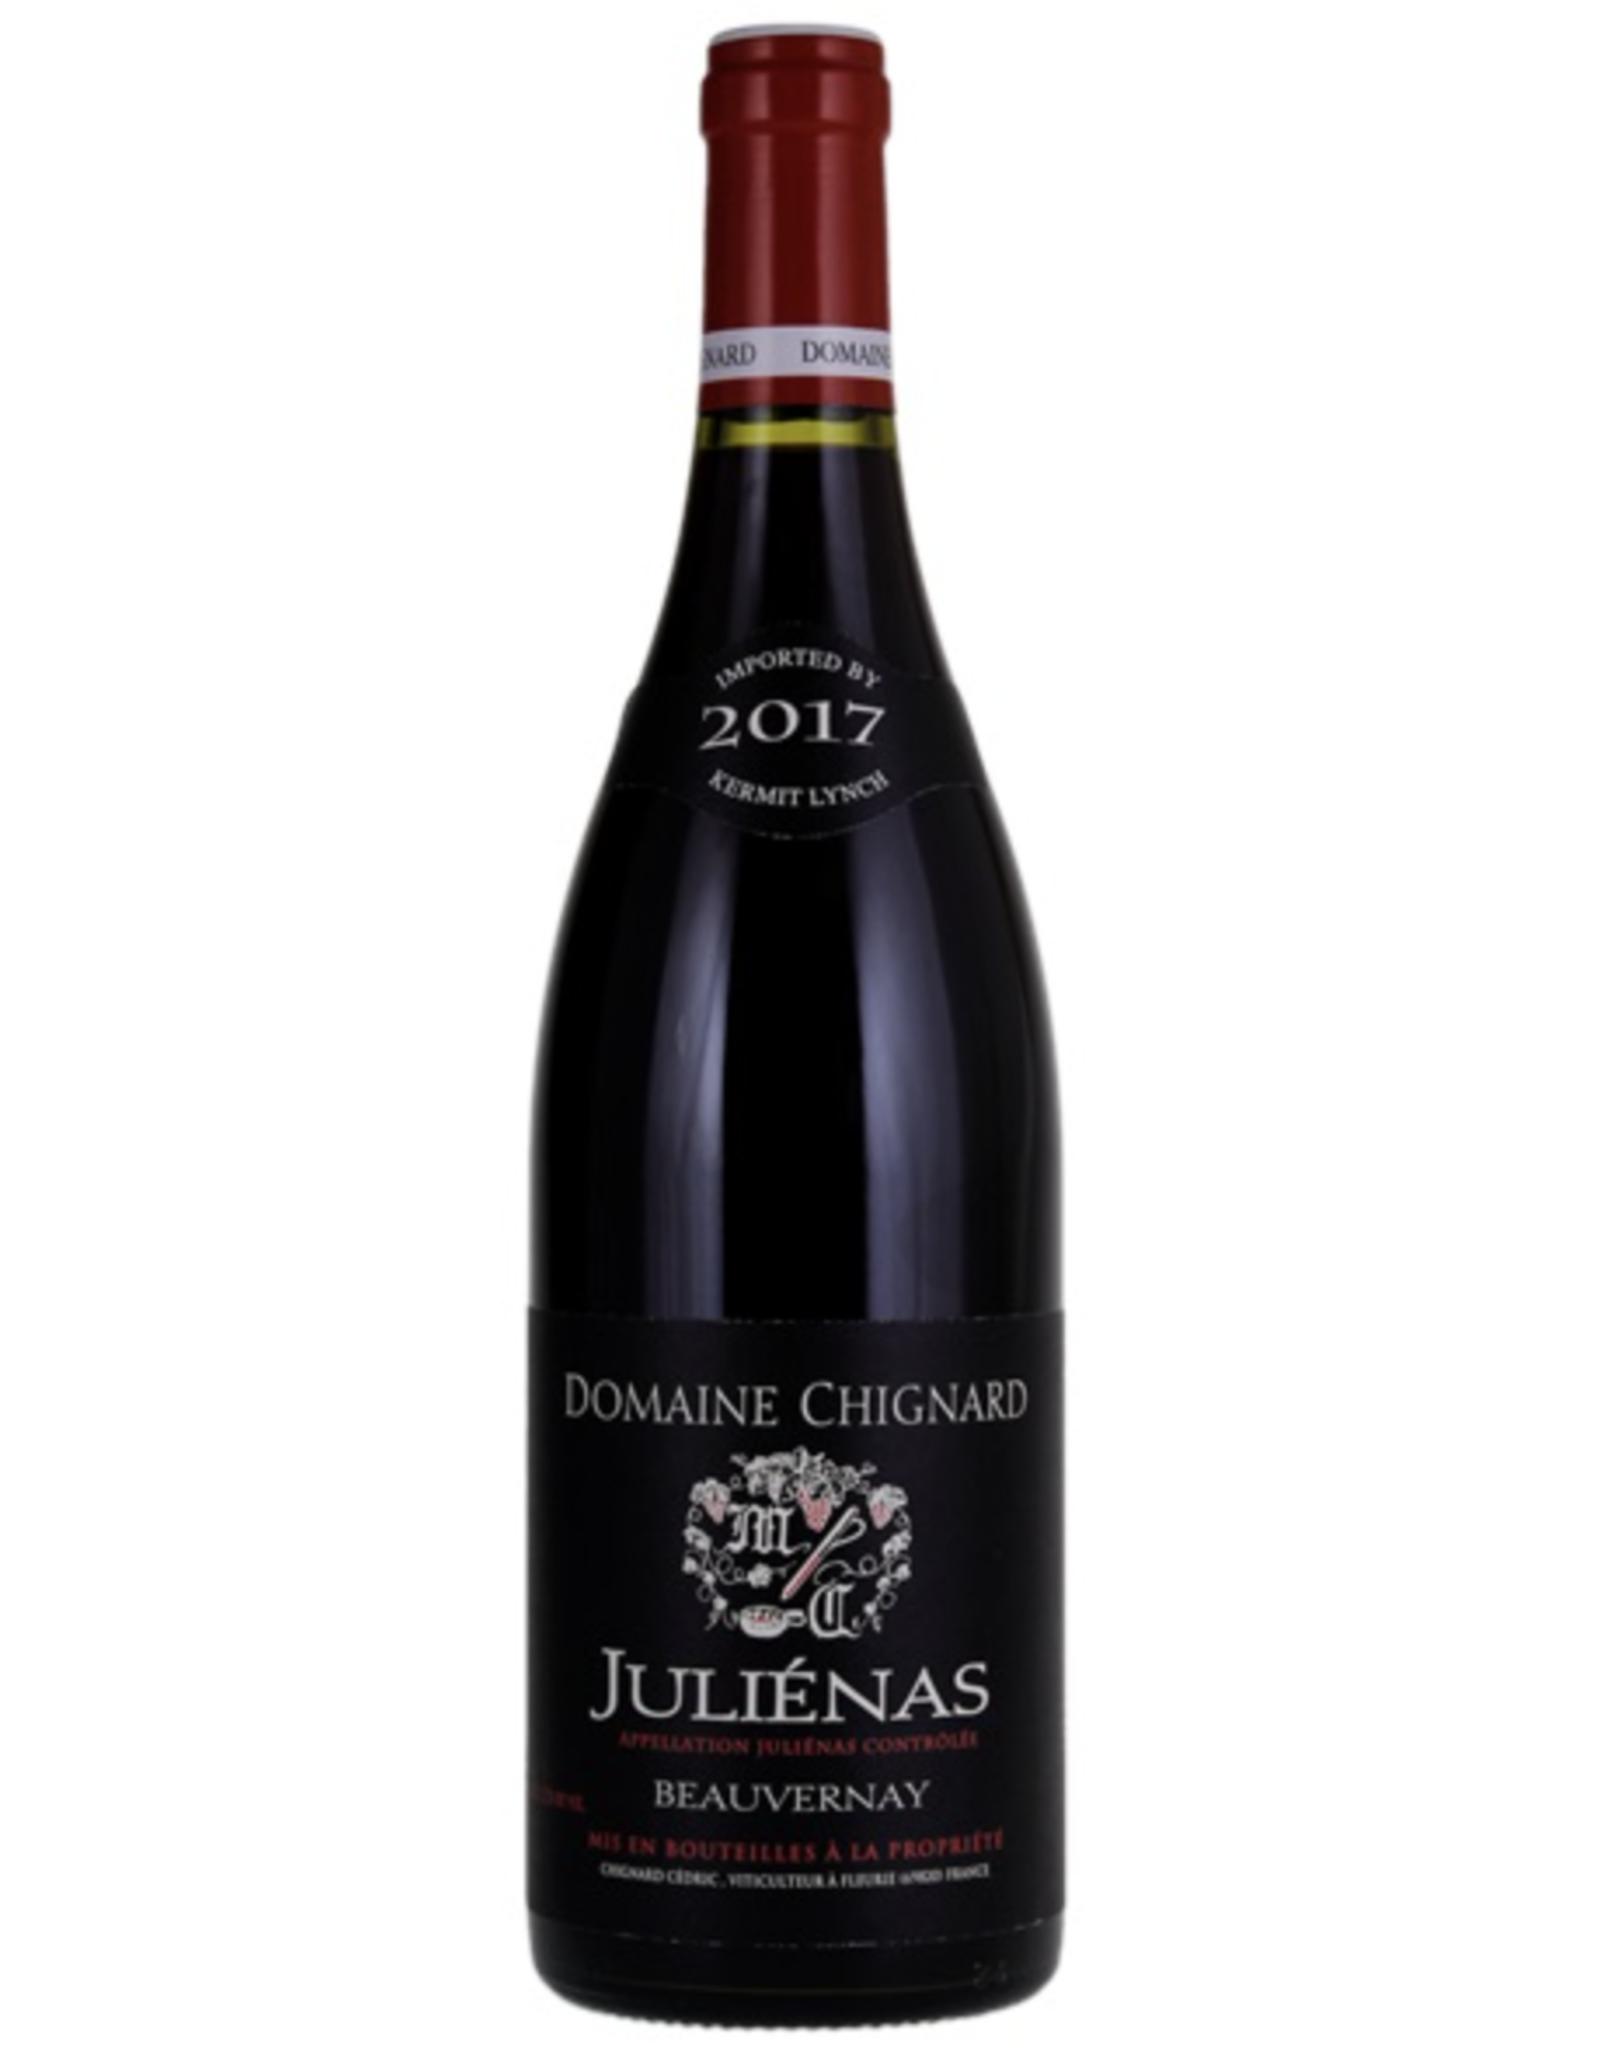 Domaine Chignard Julienas Beauvernay 2019